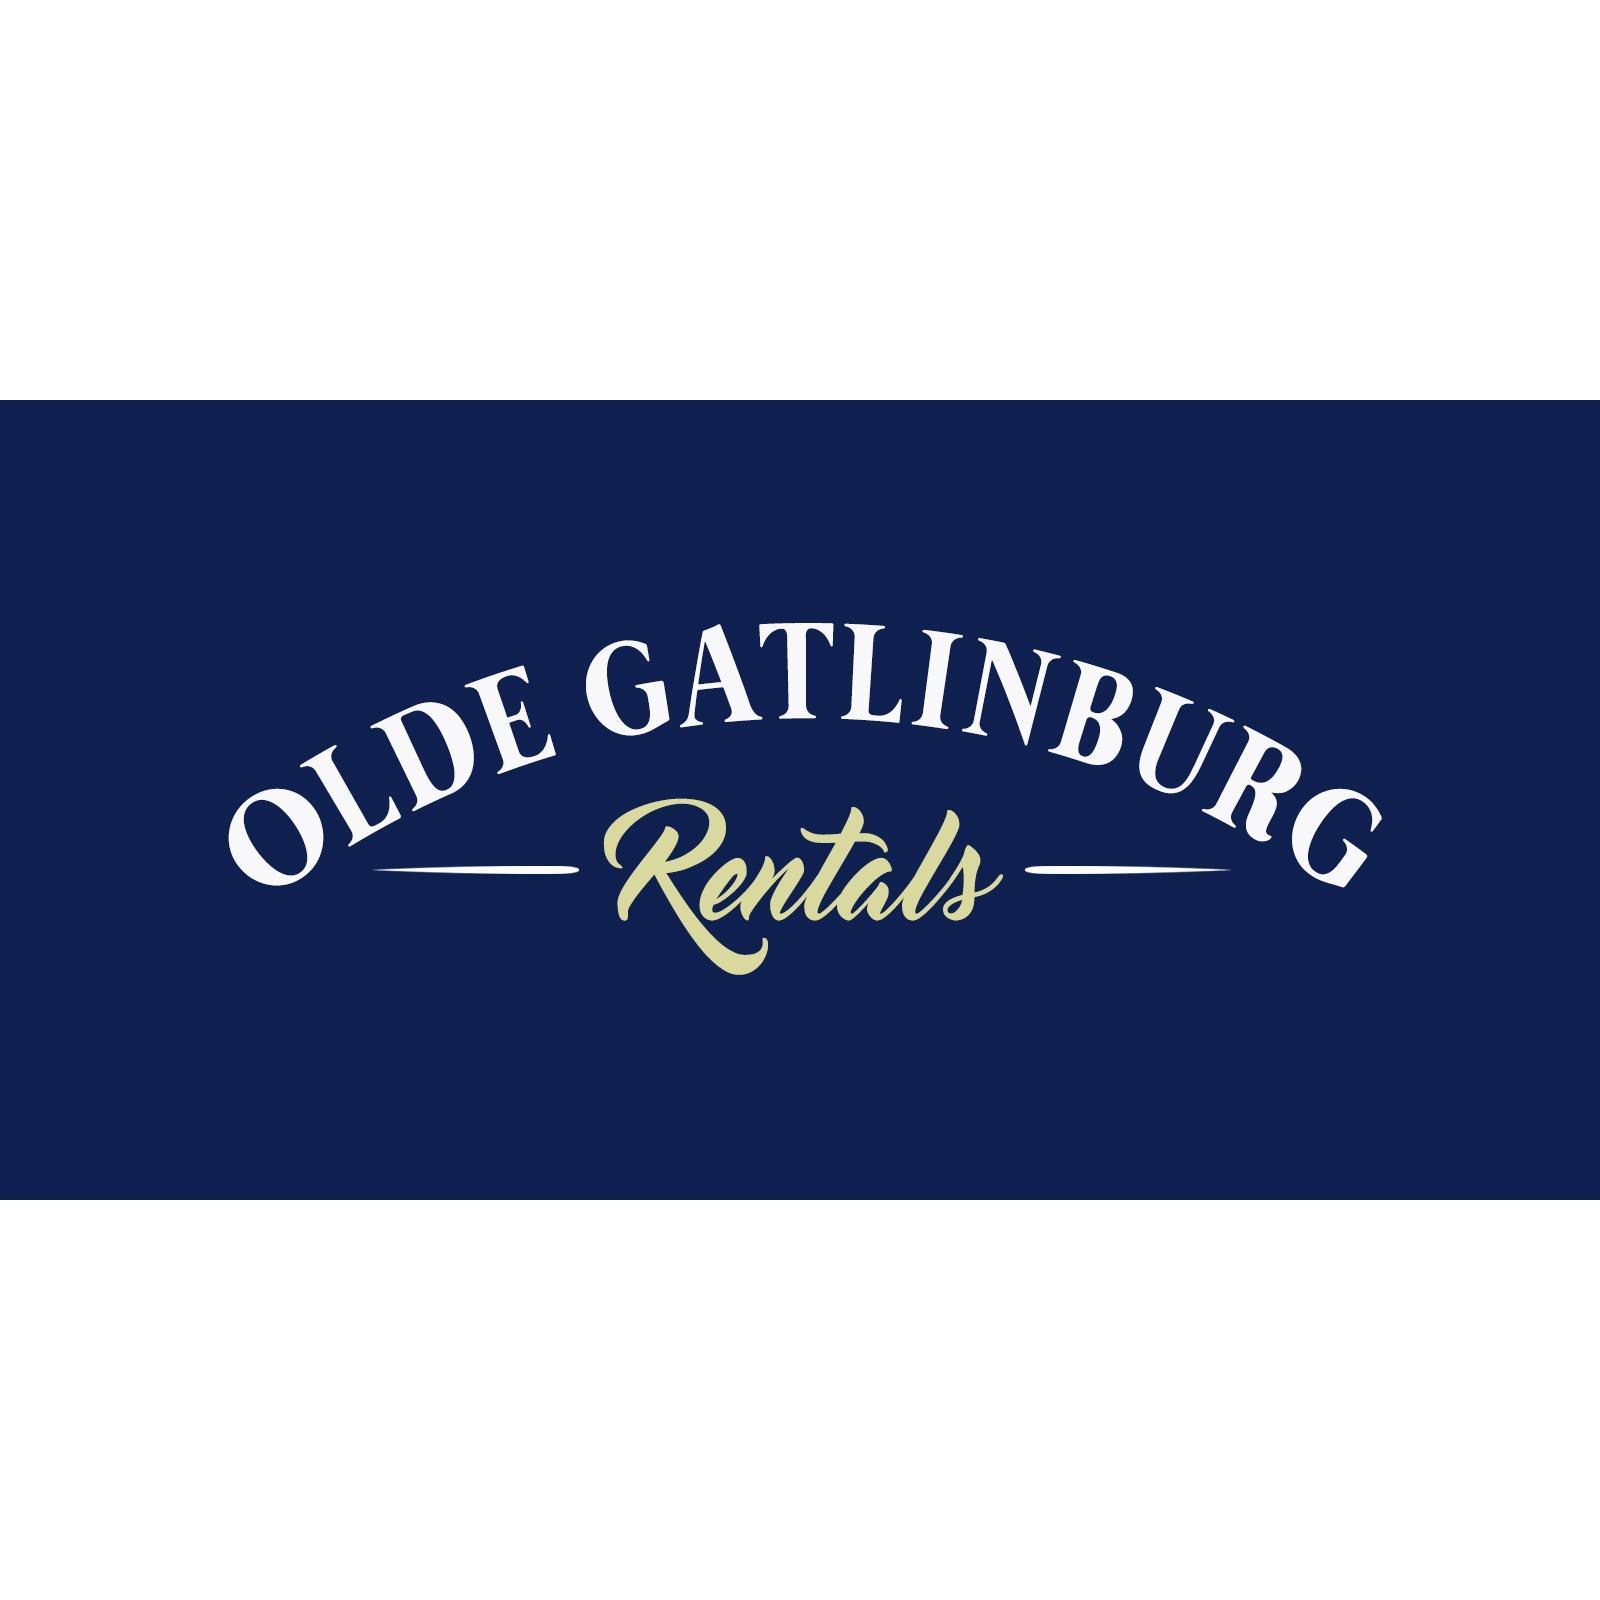 Olde Gatlinburg Rentals